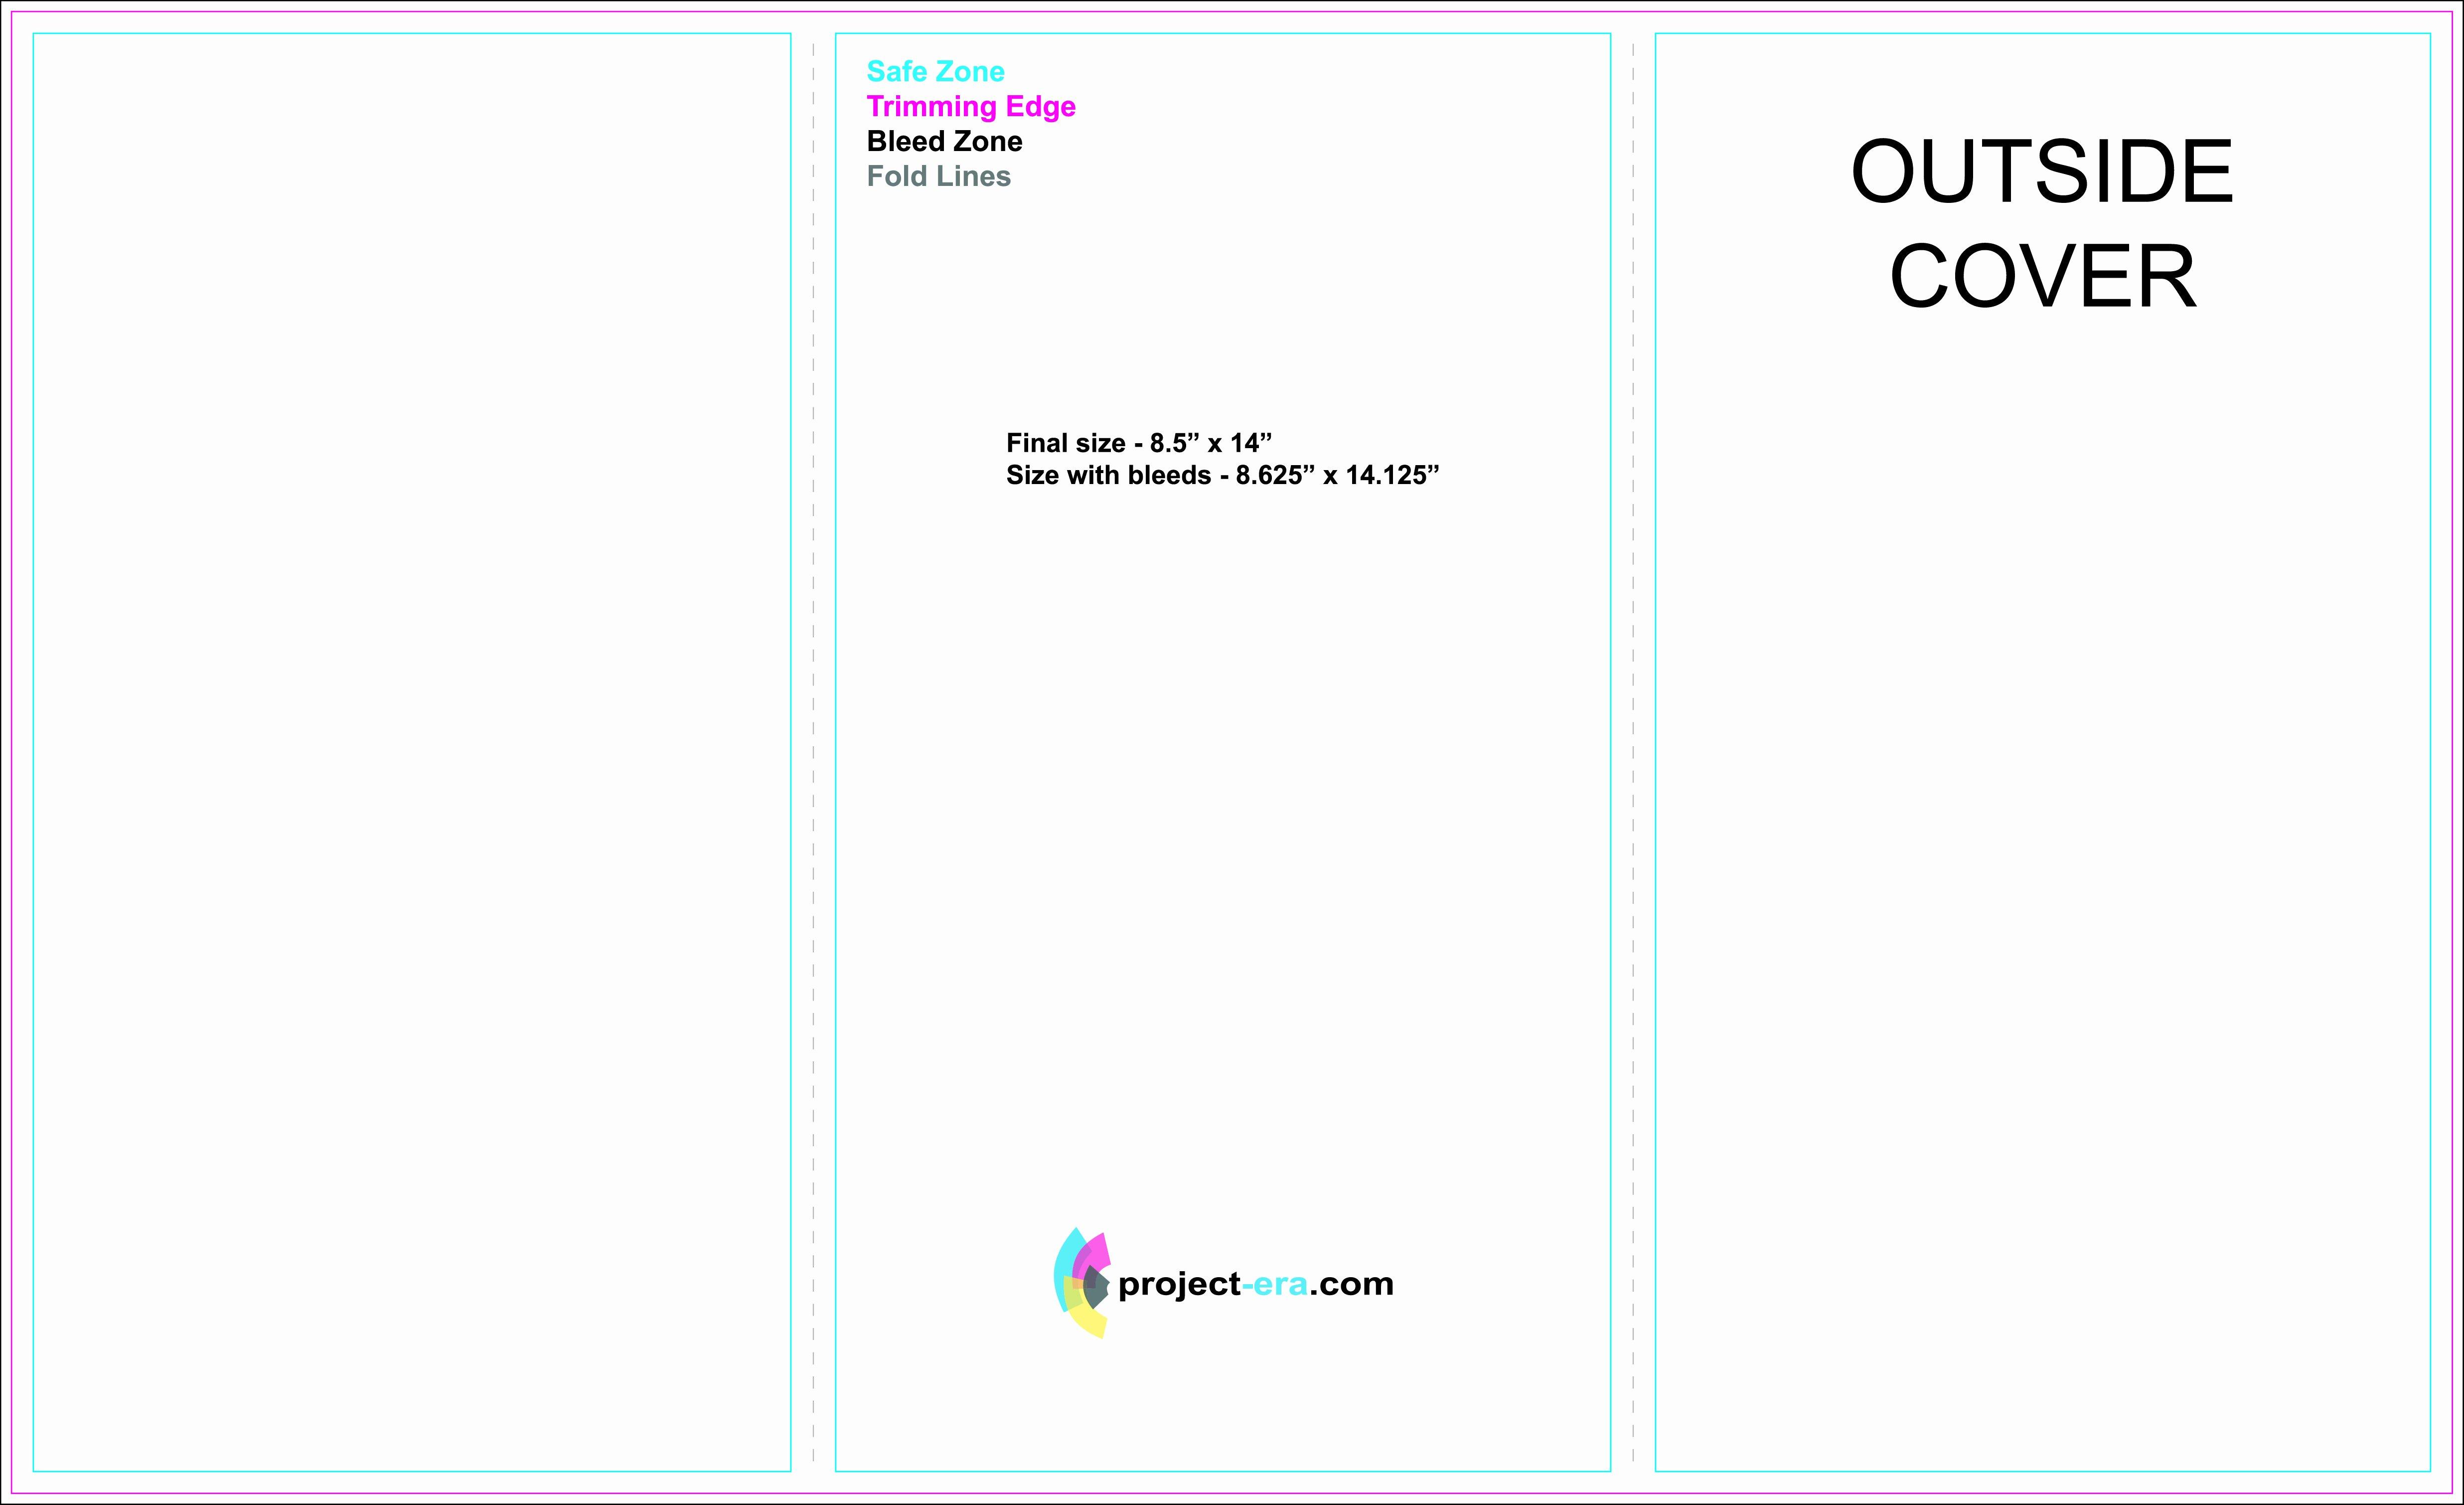 "Trifold Brochure Template Photoshop Fresh Free Tri Fold Brochure Templates Based On 8 5"" X 14"" Paper Size Design"